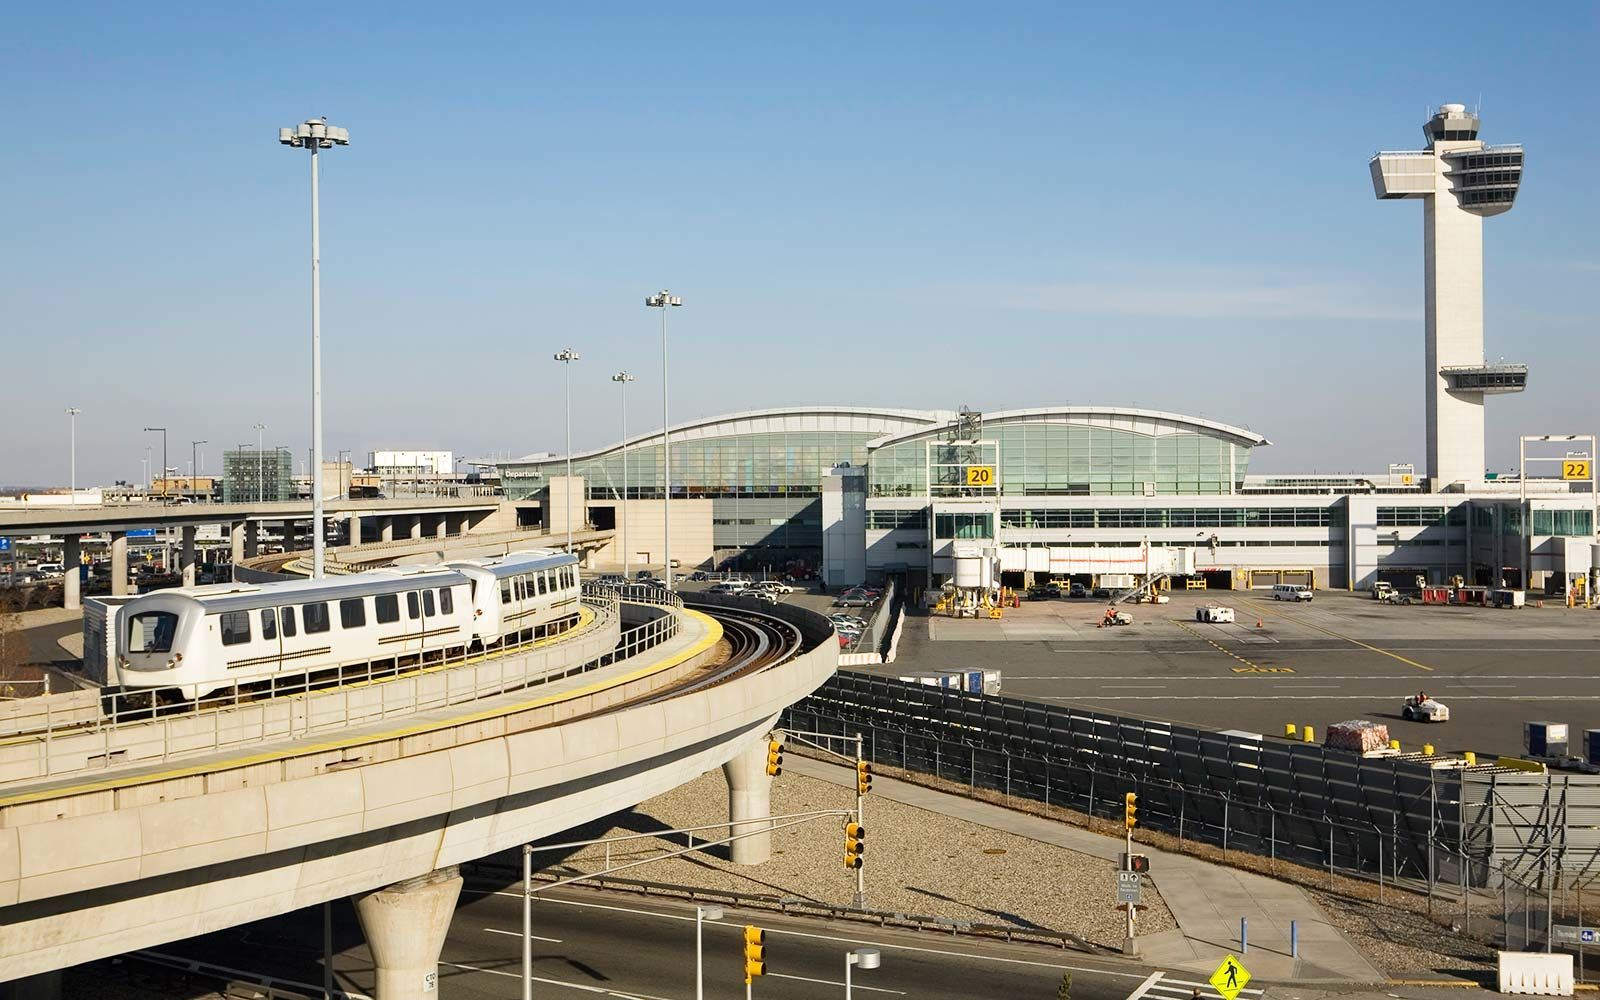 Нью-Йорк аэропорт Джона Кеннеди